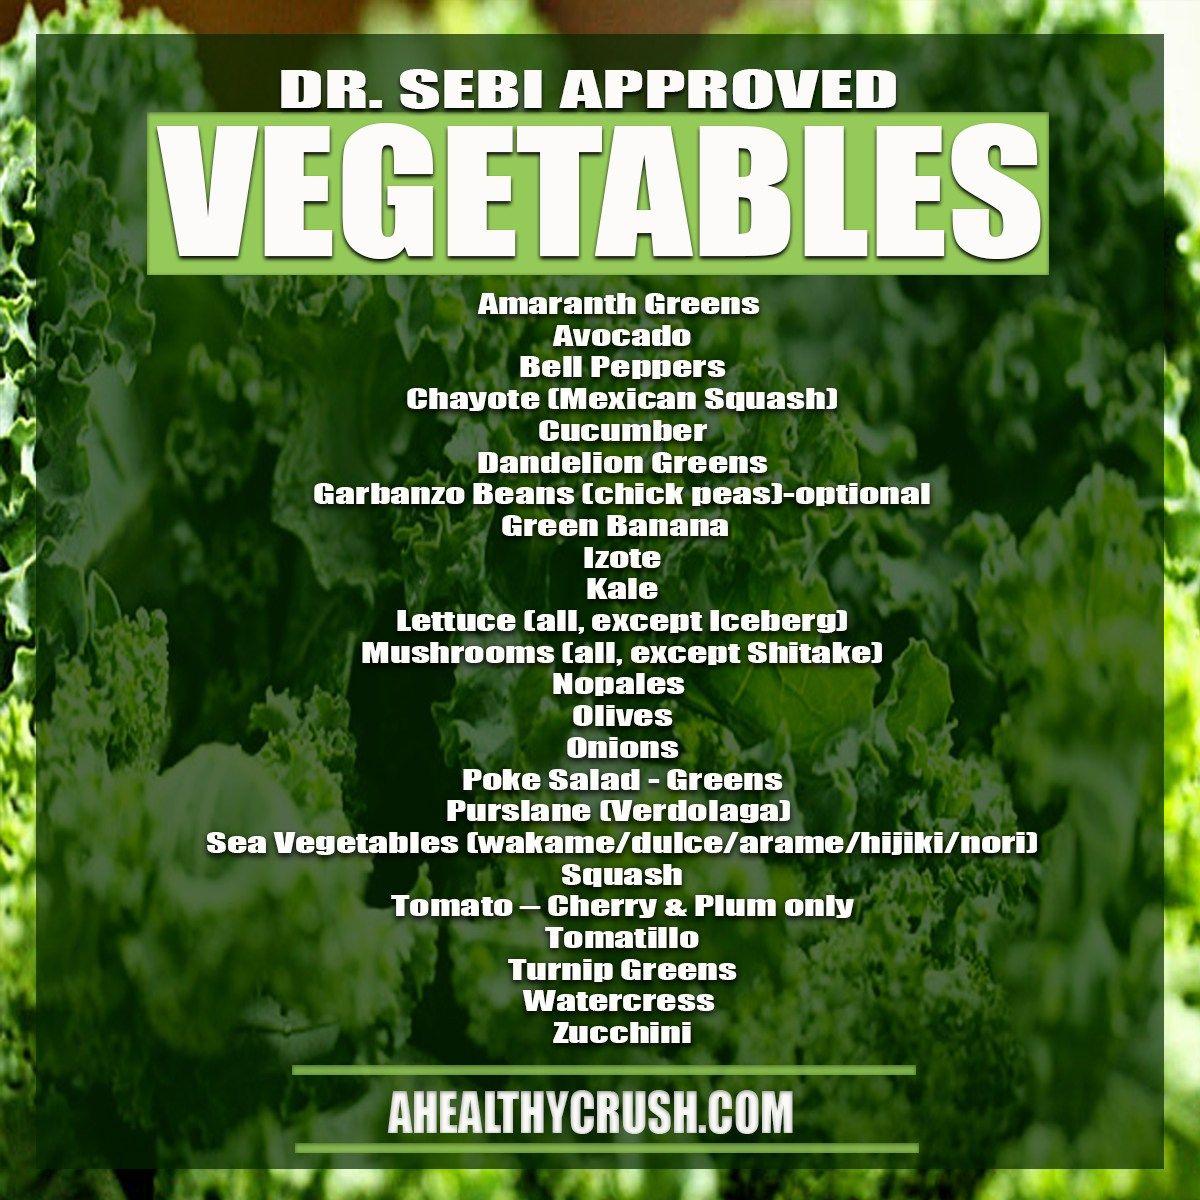 DR. SEBI NUTRITIONAL GUIDE